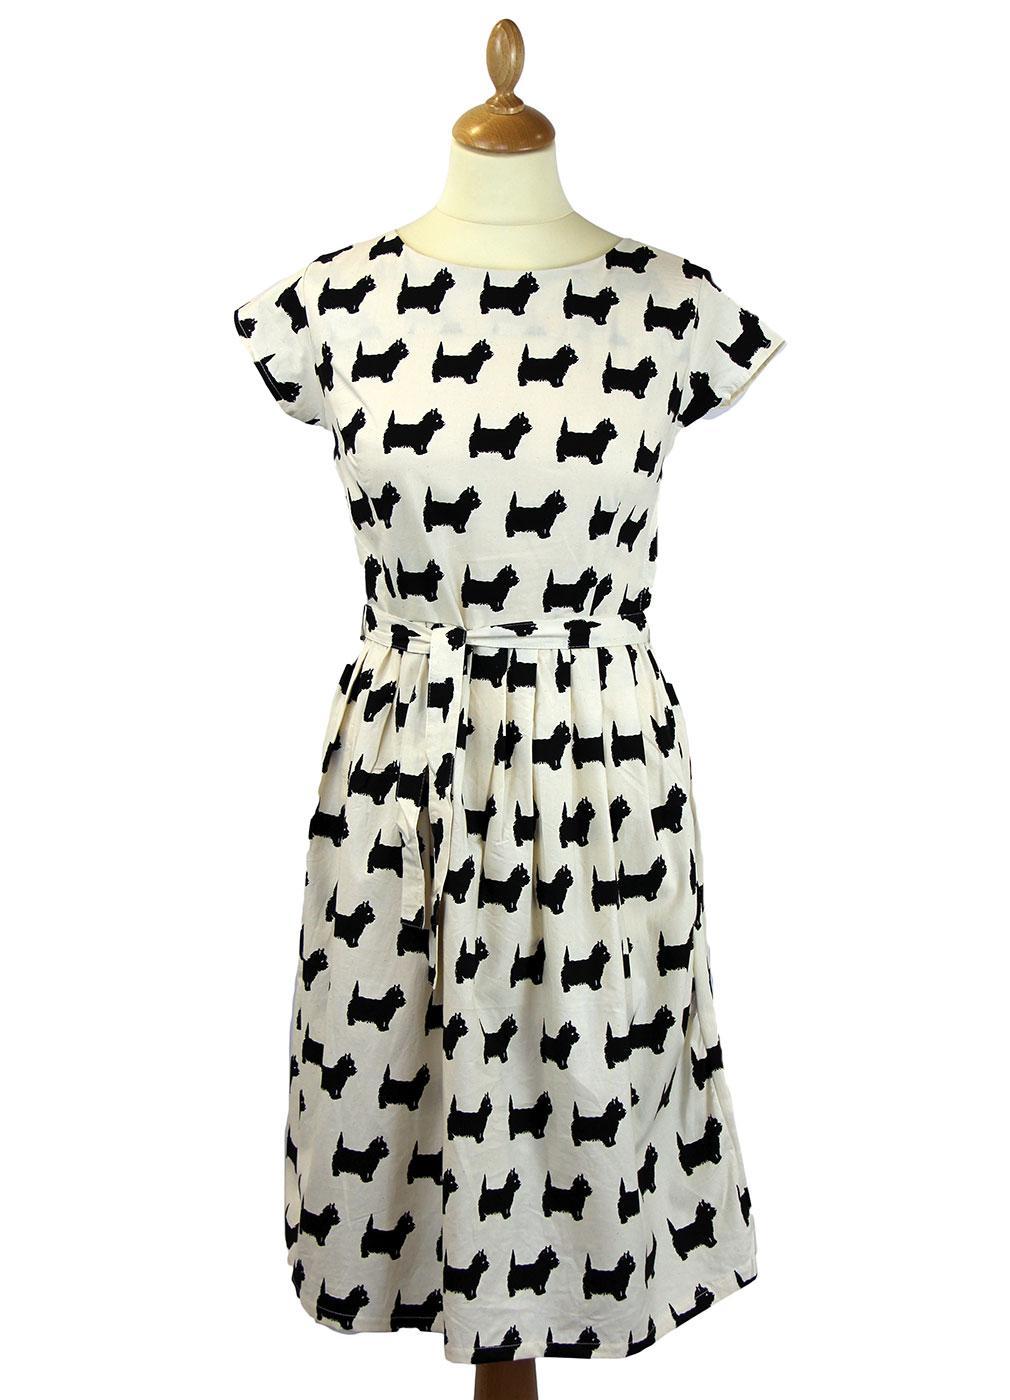 Scottie Dog Retro 1950s Vintage Summer Tea Dress In Ecru Black